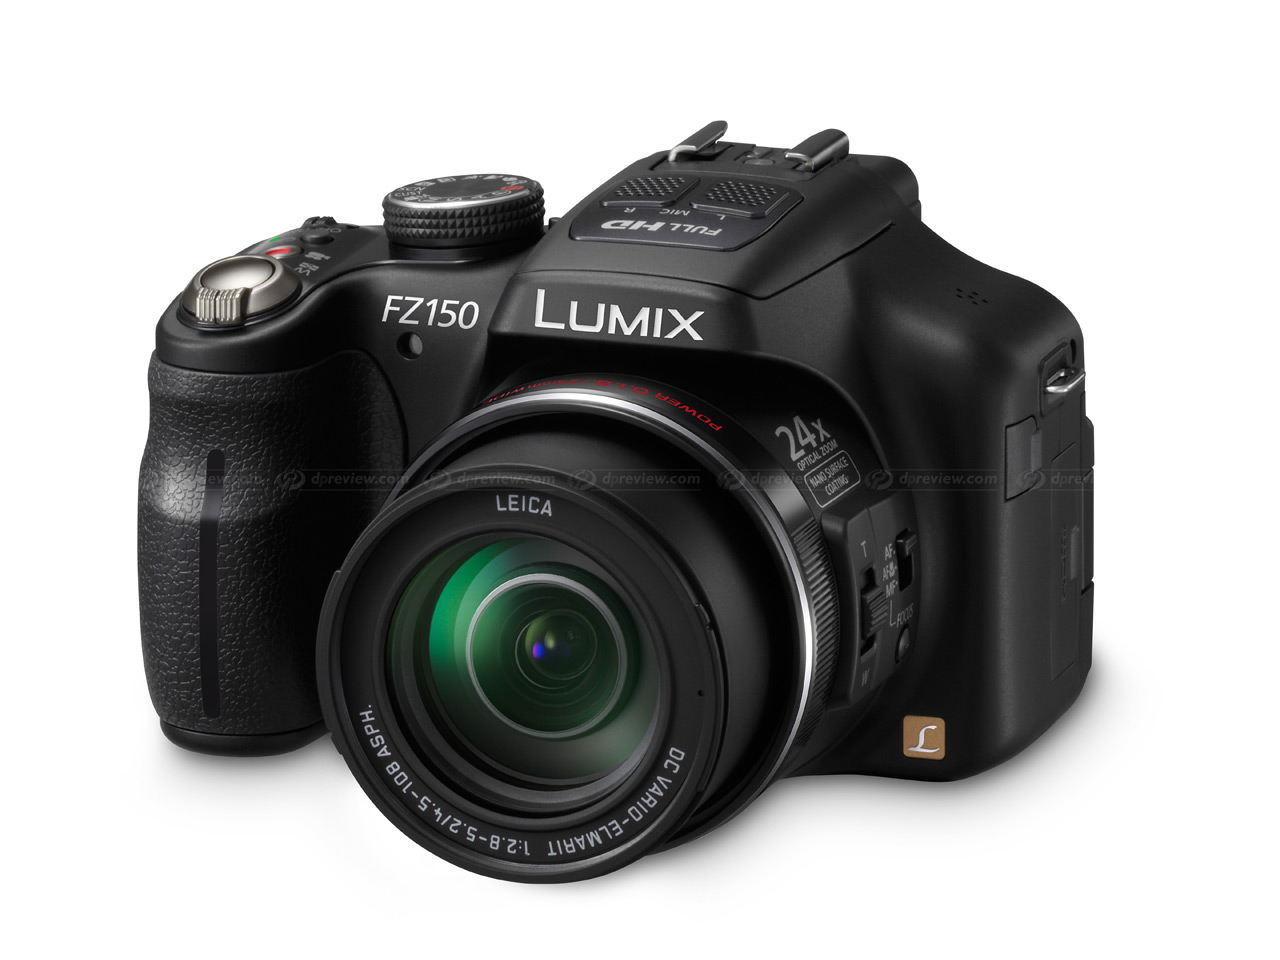 Premium BATERIA para Panasonic Lumix dmc-fz50 DMC-Fz 50